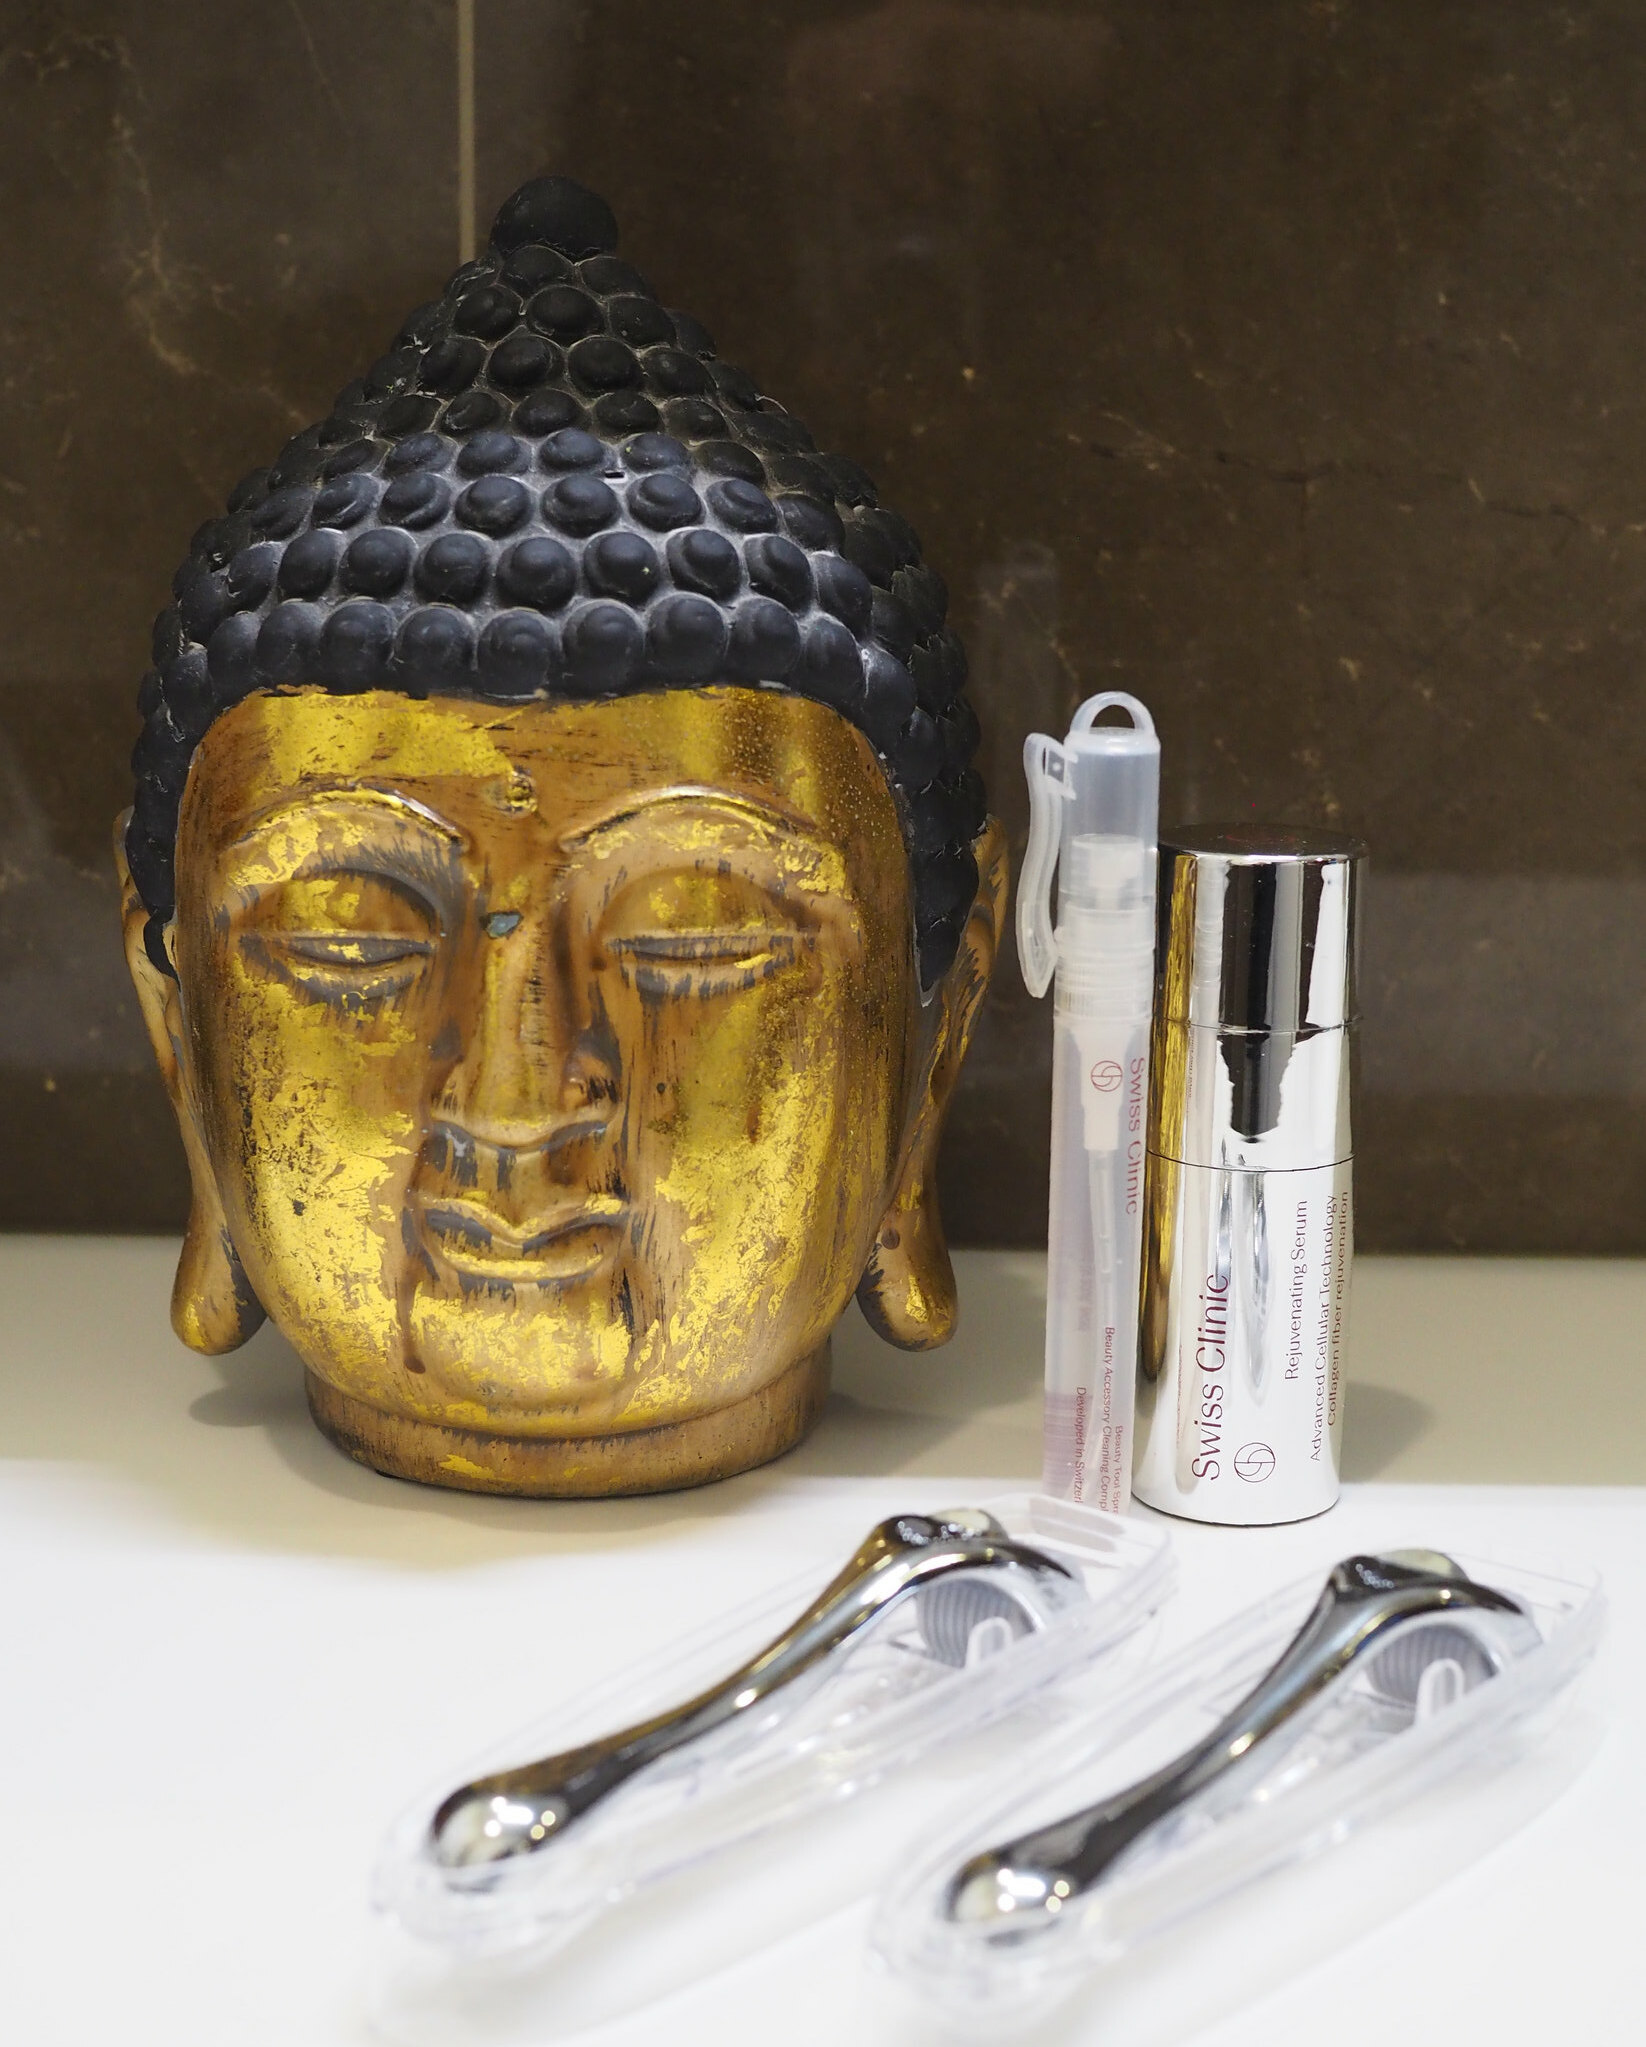 Swiss Clinic Skin Renewal, Business Woman